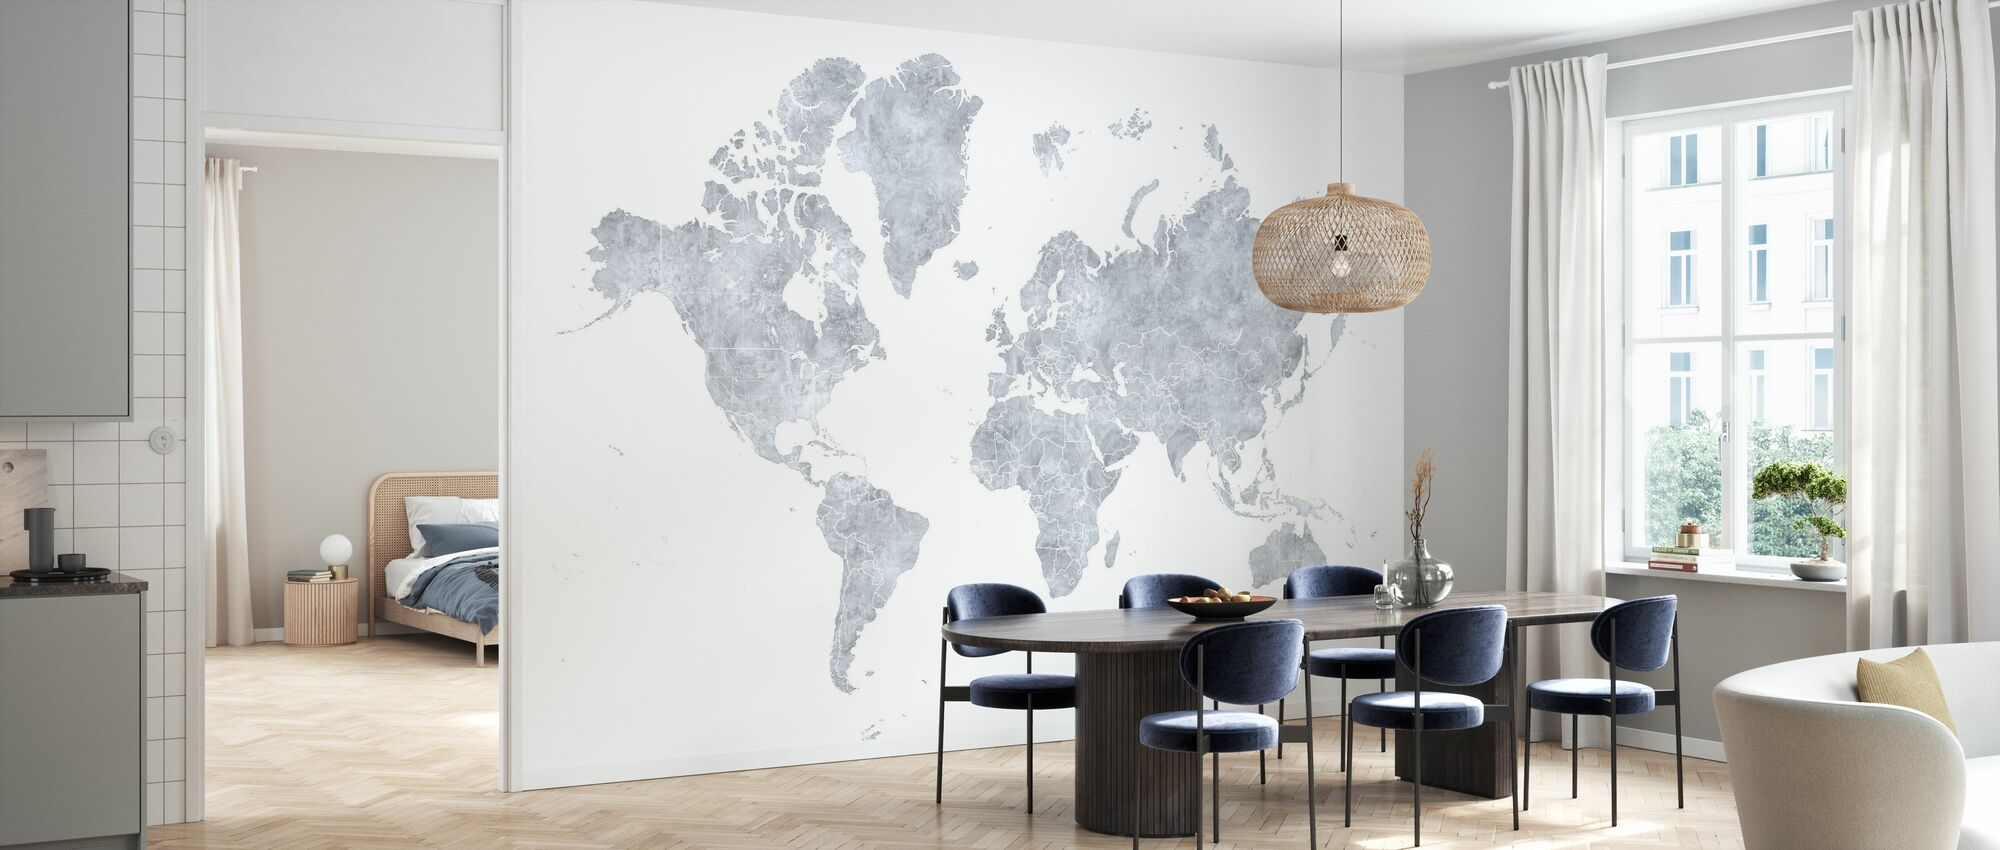 Weltkarte ohne V - Tapete - Küchen